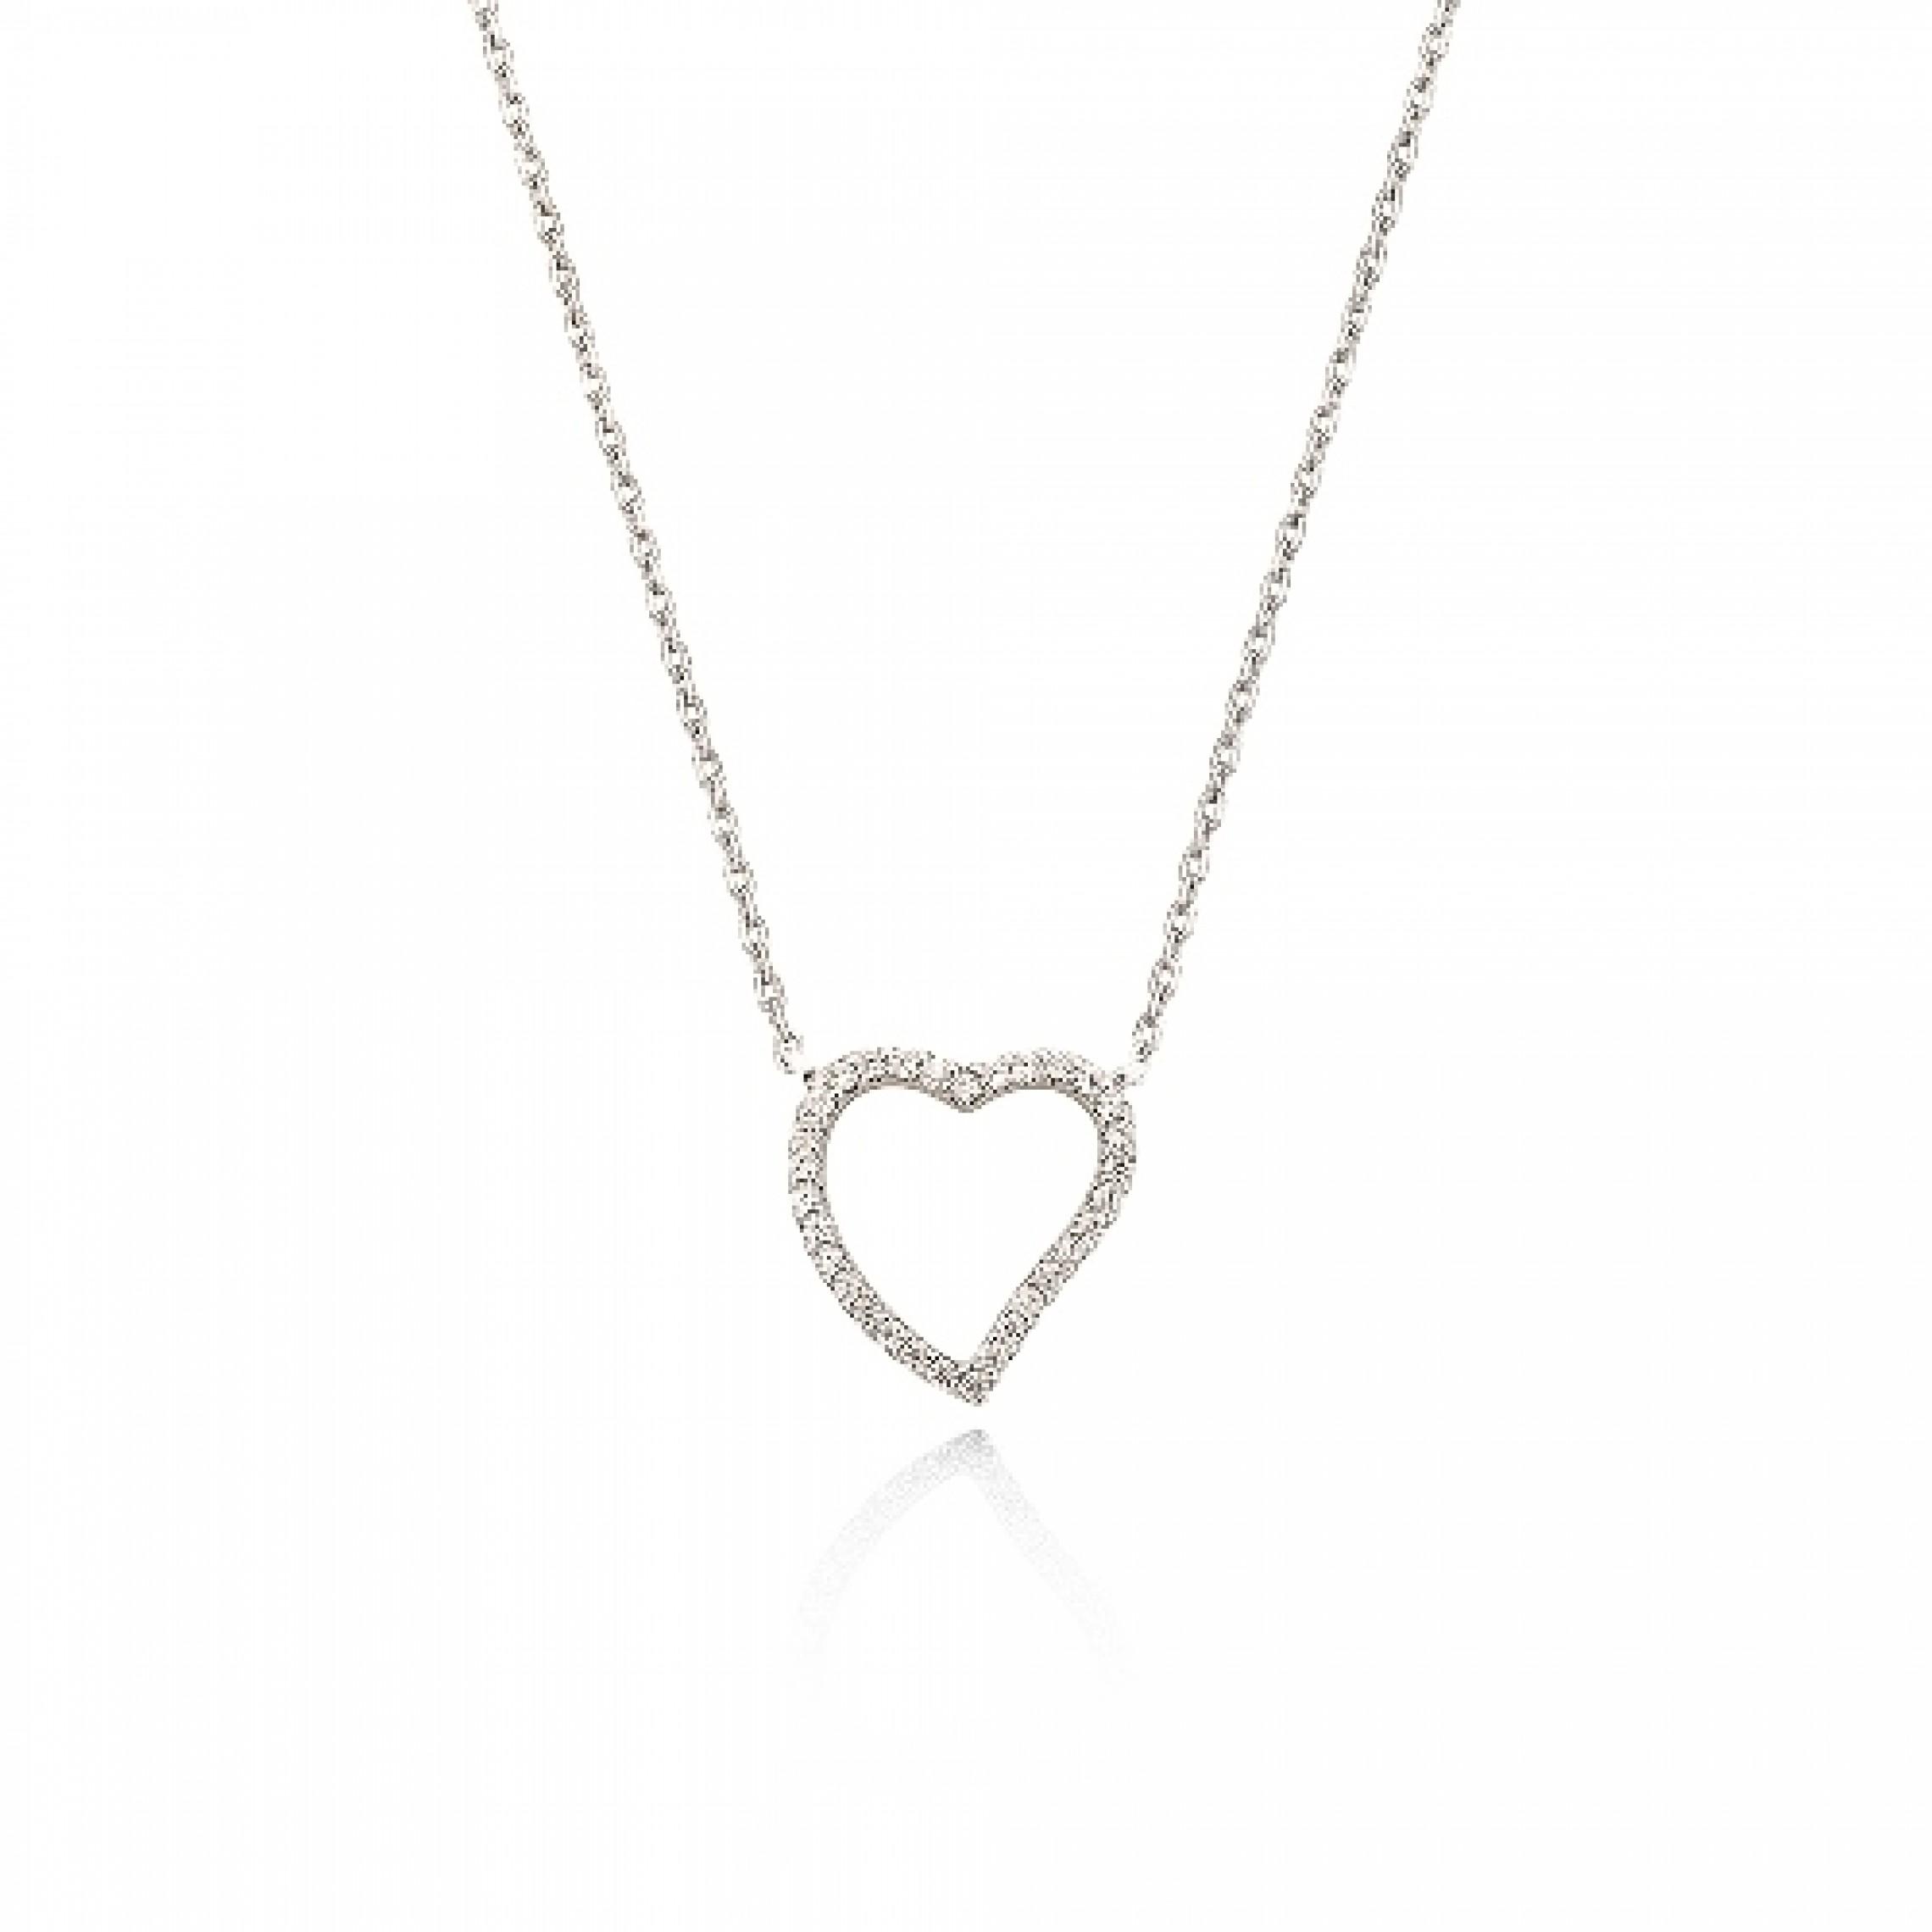 JN-190173 Evil Eye 925 Sterling Silver CZ Necklace Heart